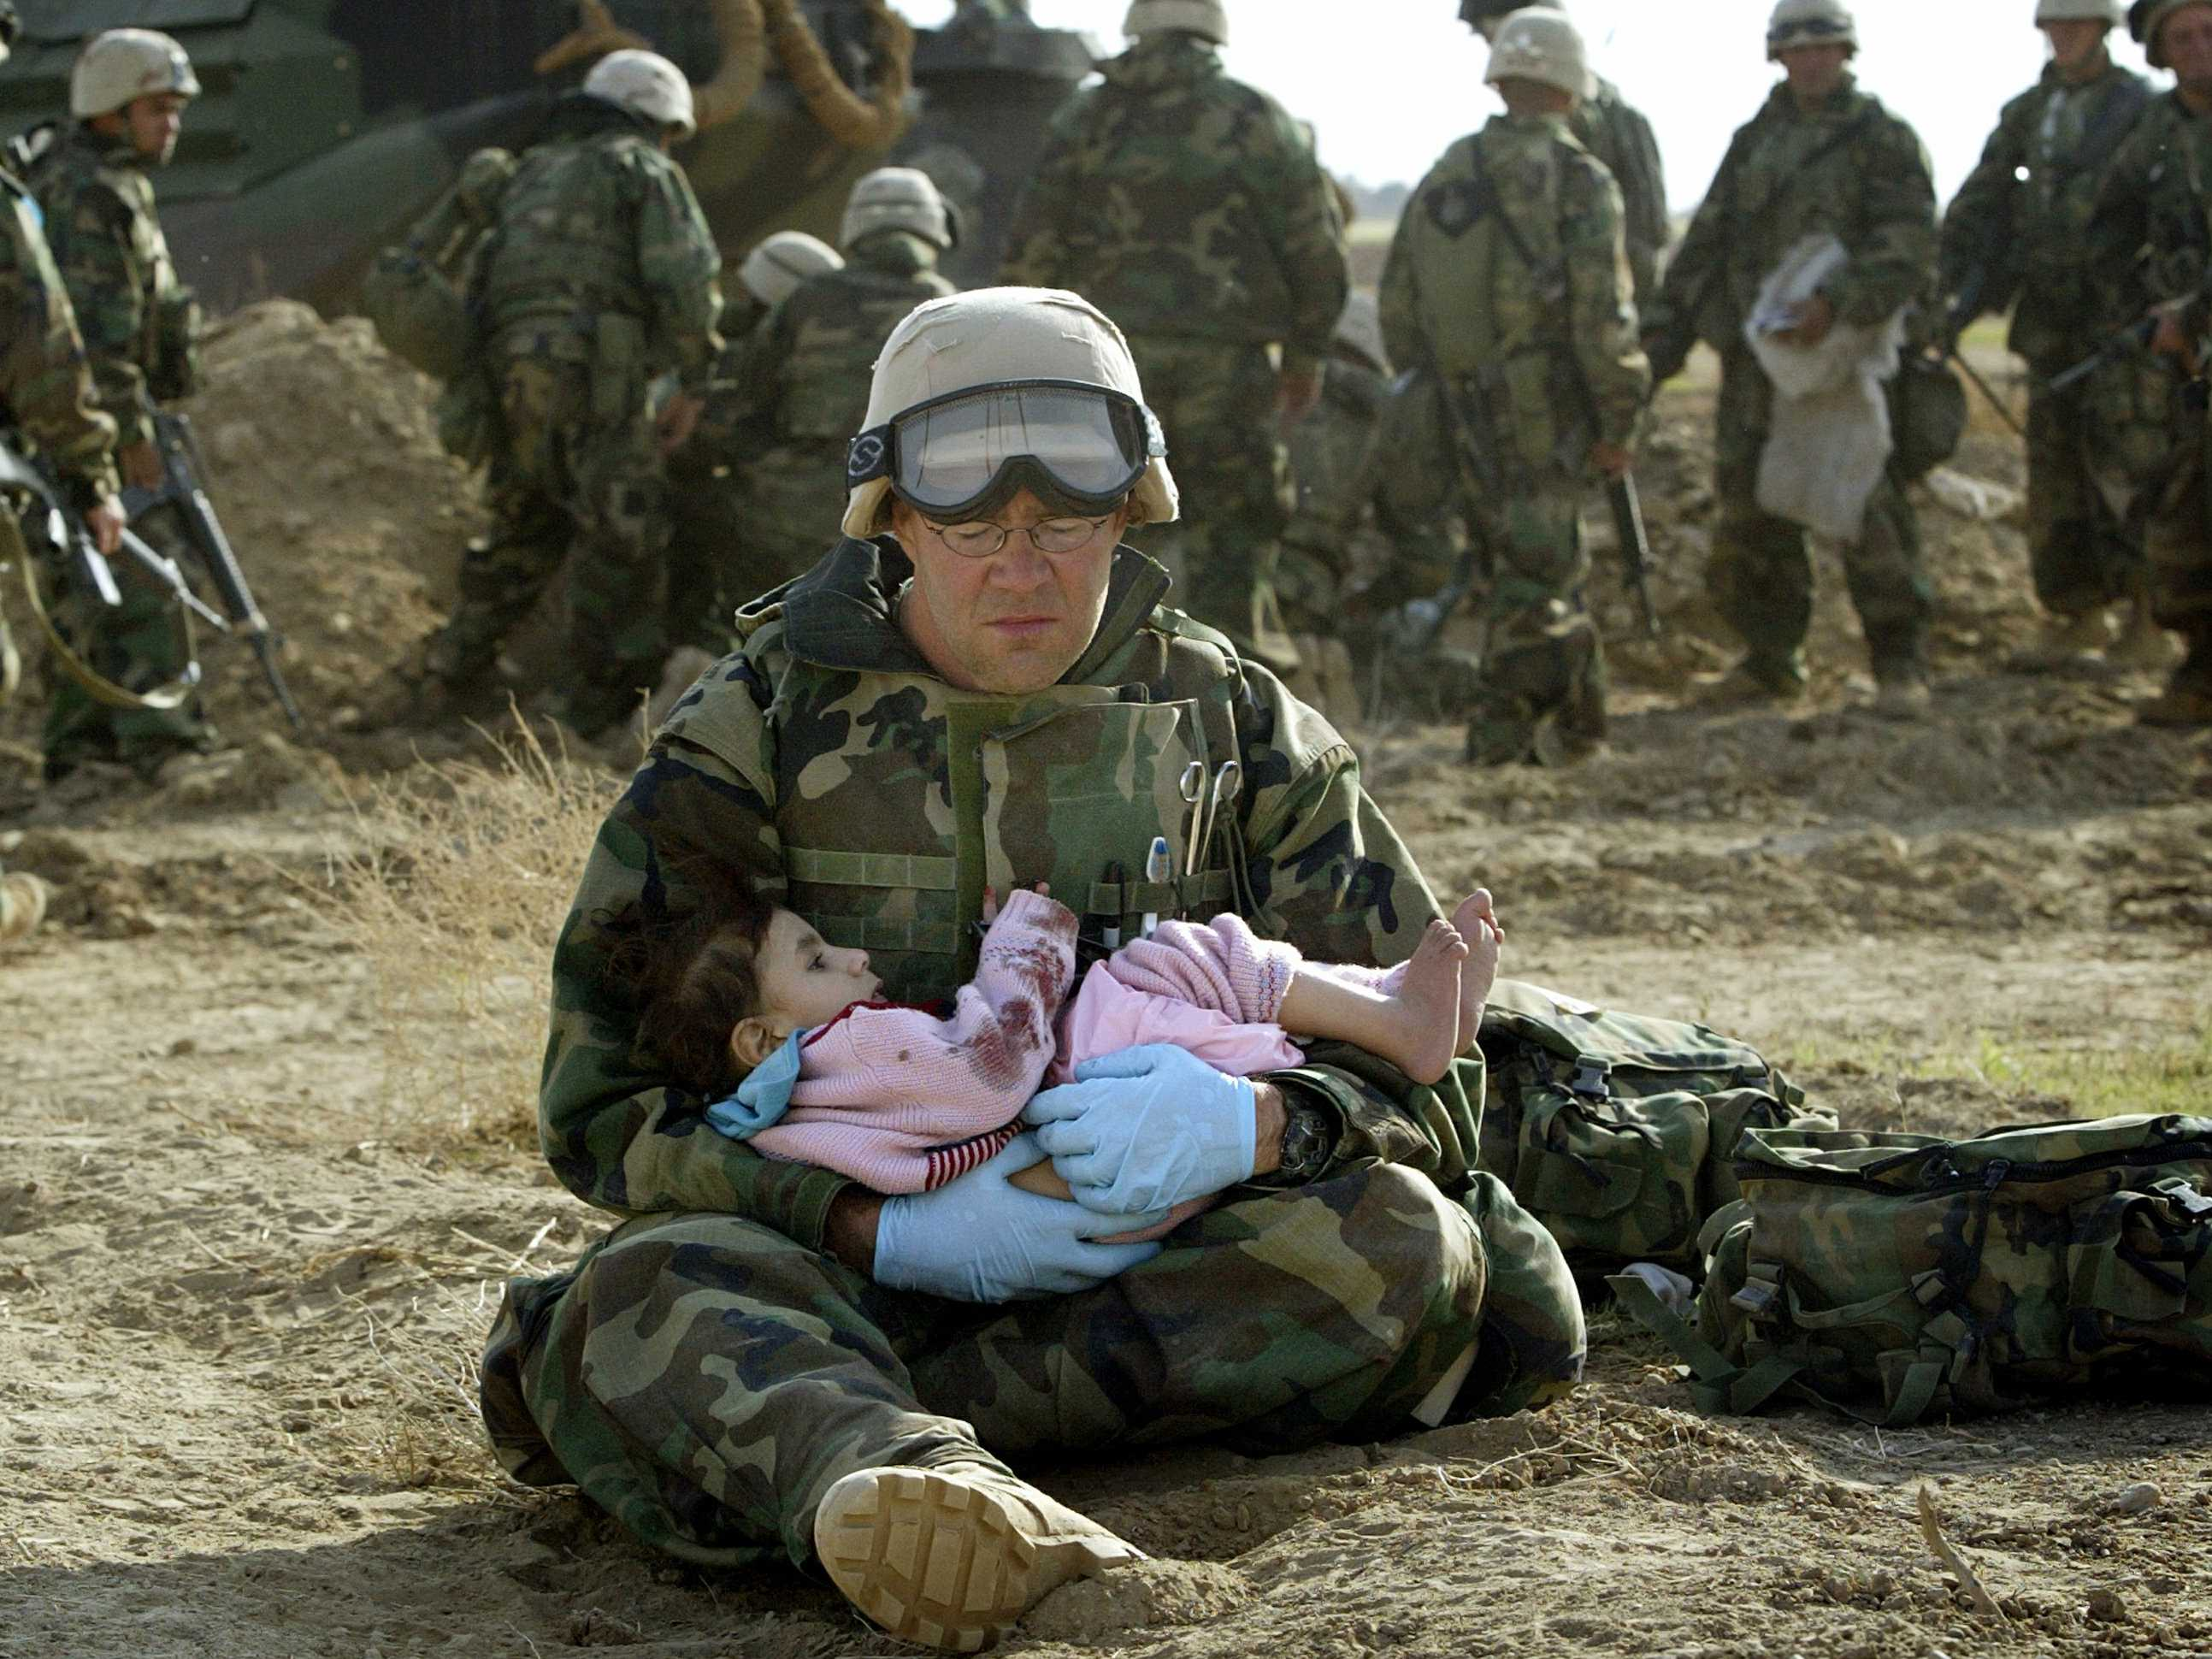 persian-music.orgIraq-Soldier-baby.jpg